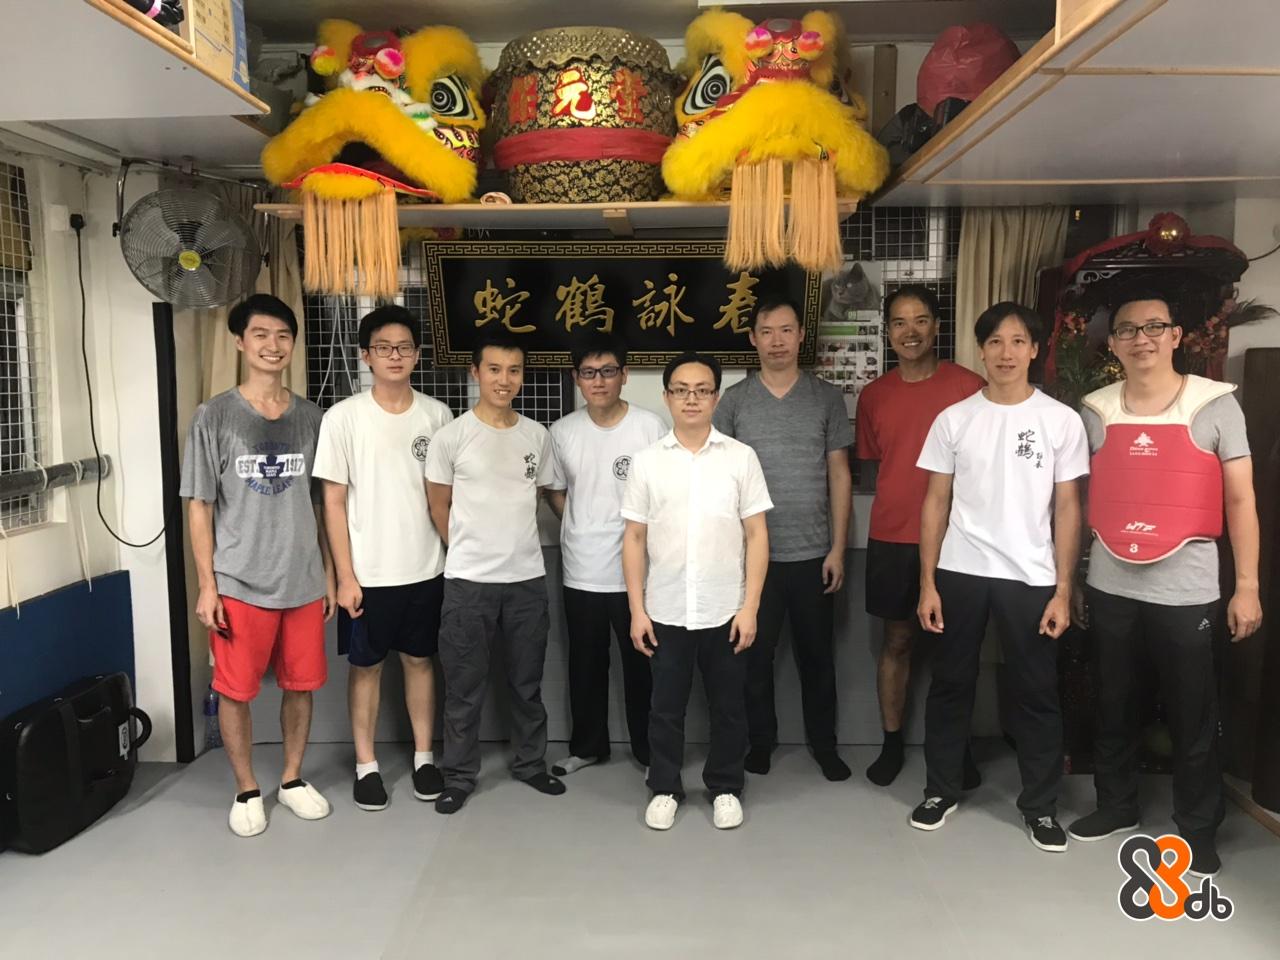 P525 蛇鶴詠春 EST1917 ALEEN  Social group,Team,Event,